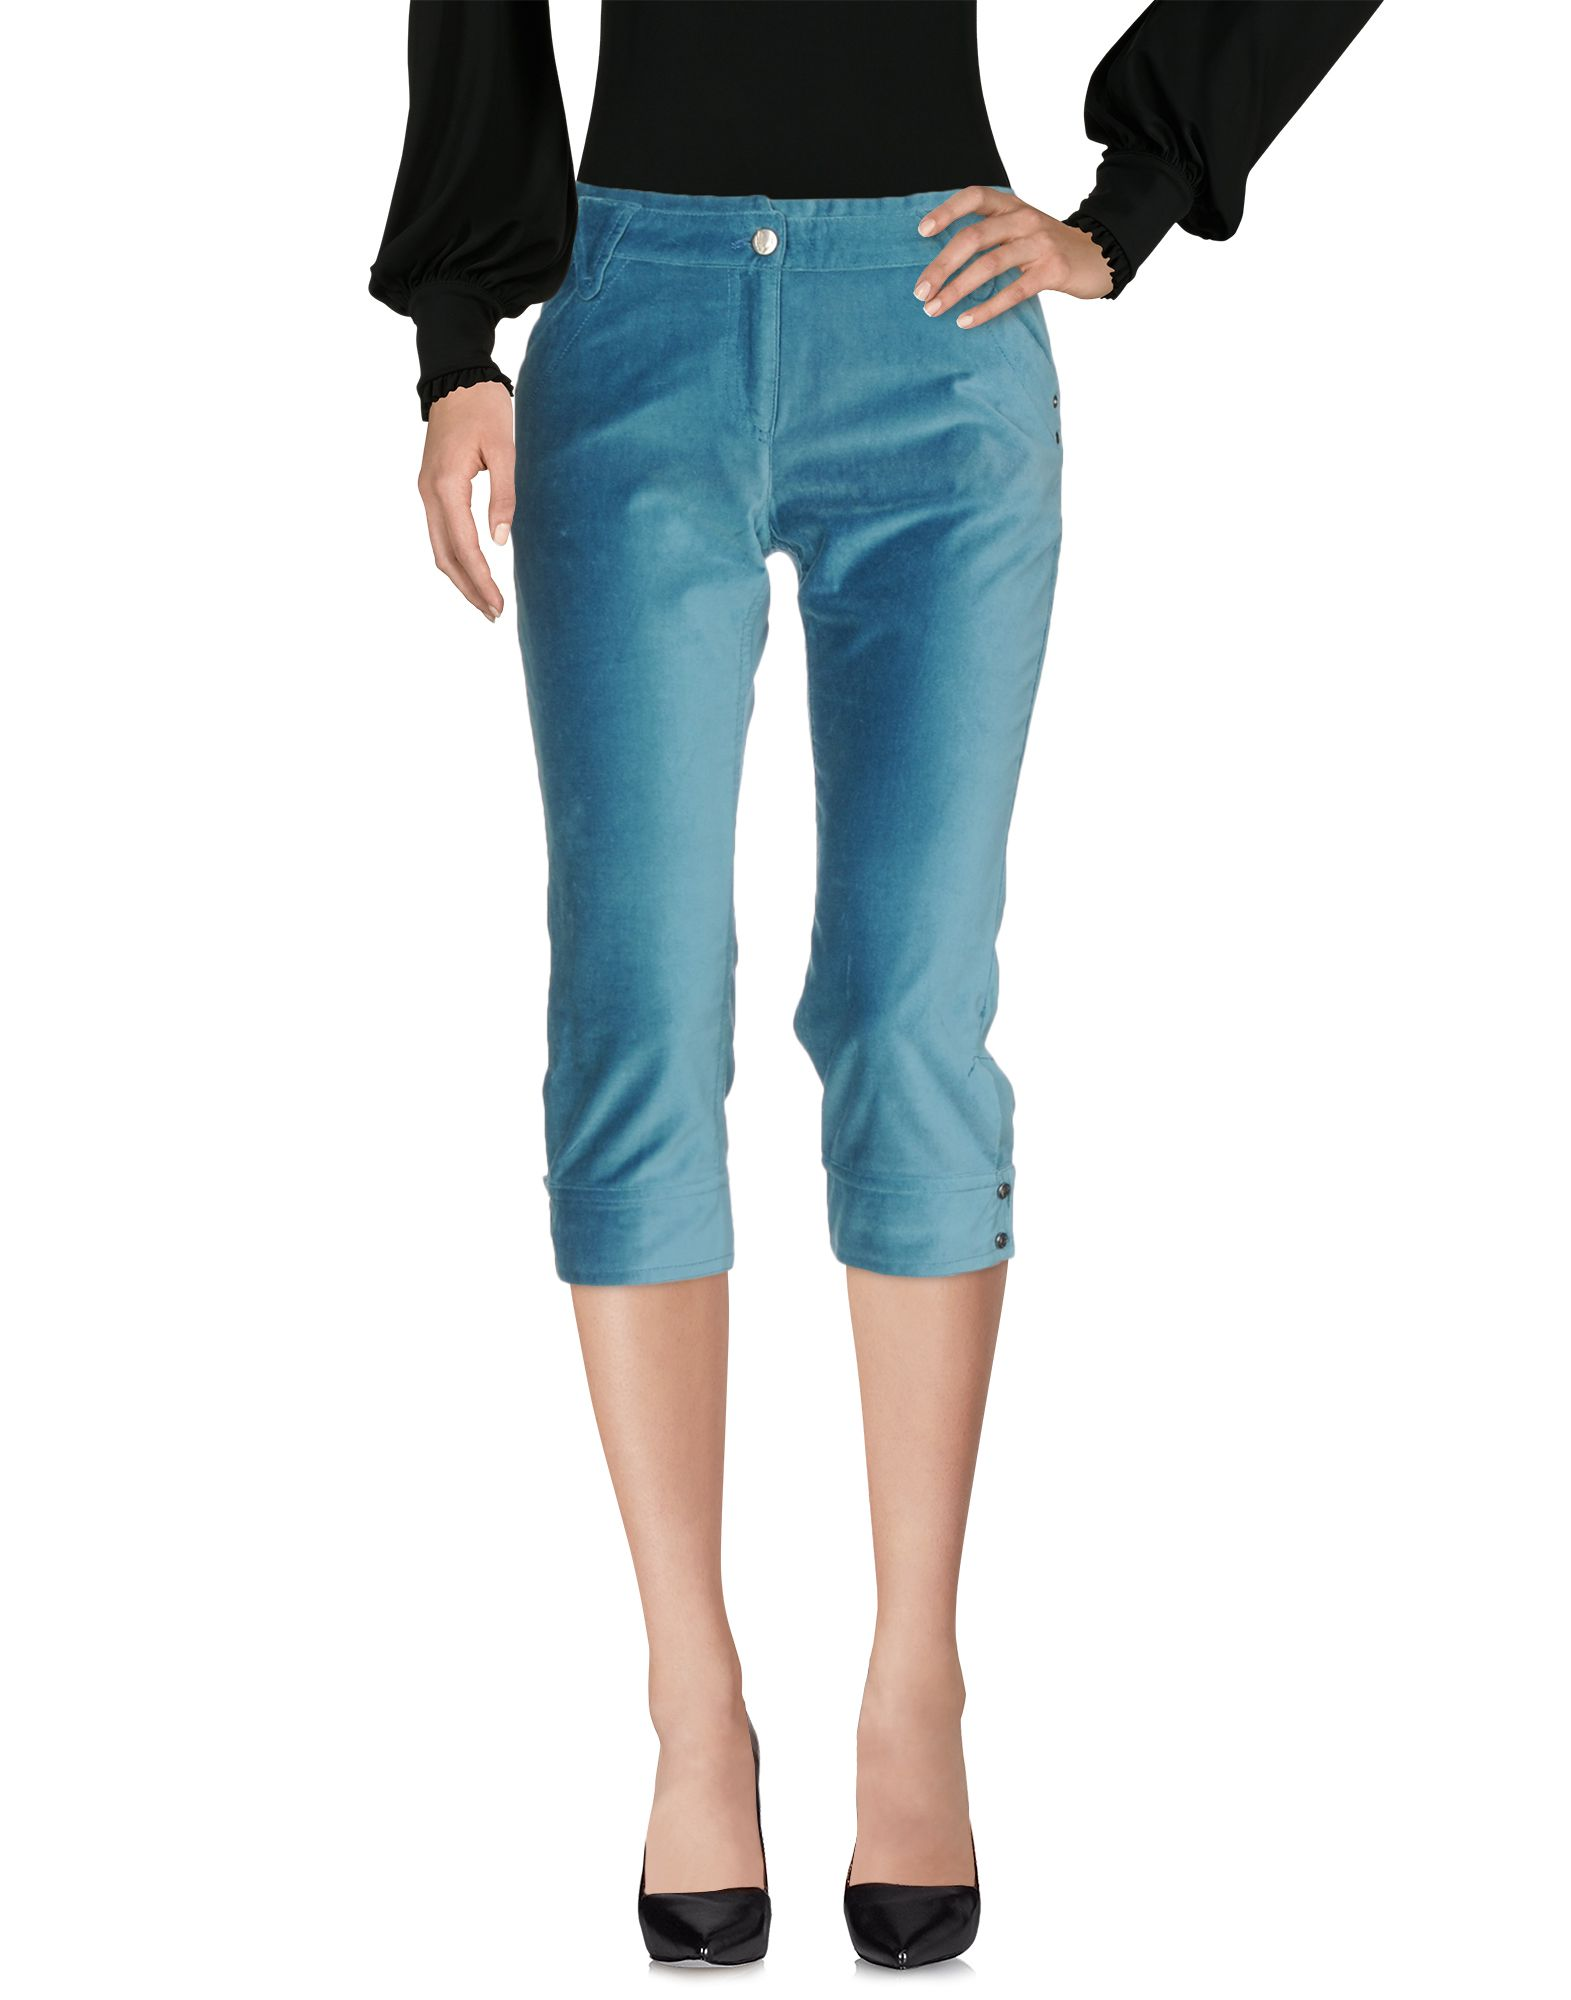 Pantalone Dritto Versace Sport Donna - Acquista online su WJzz42K